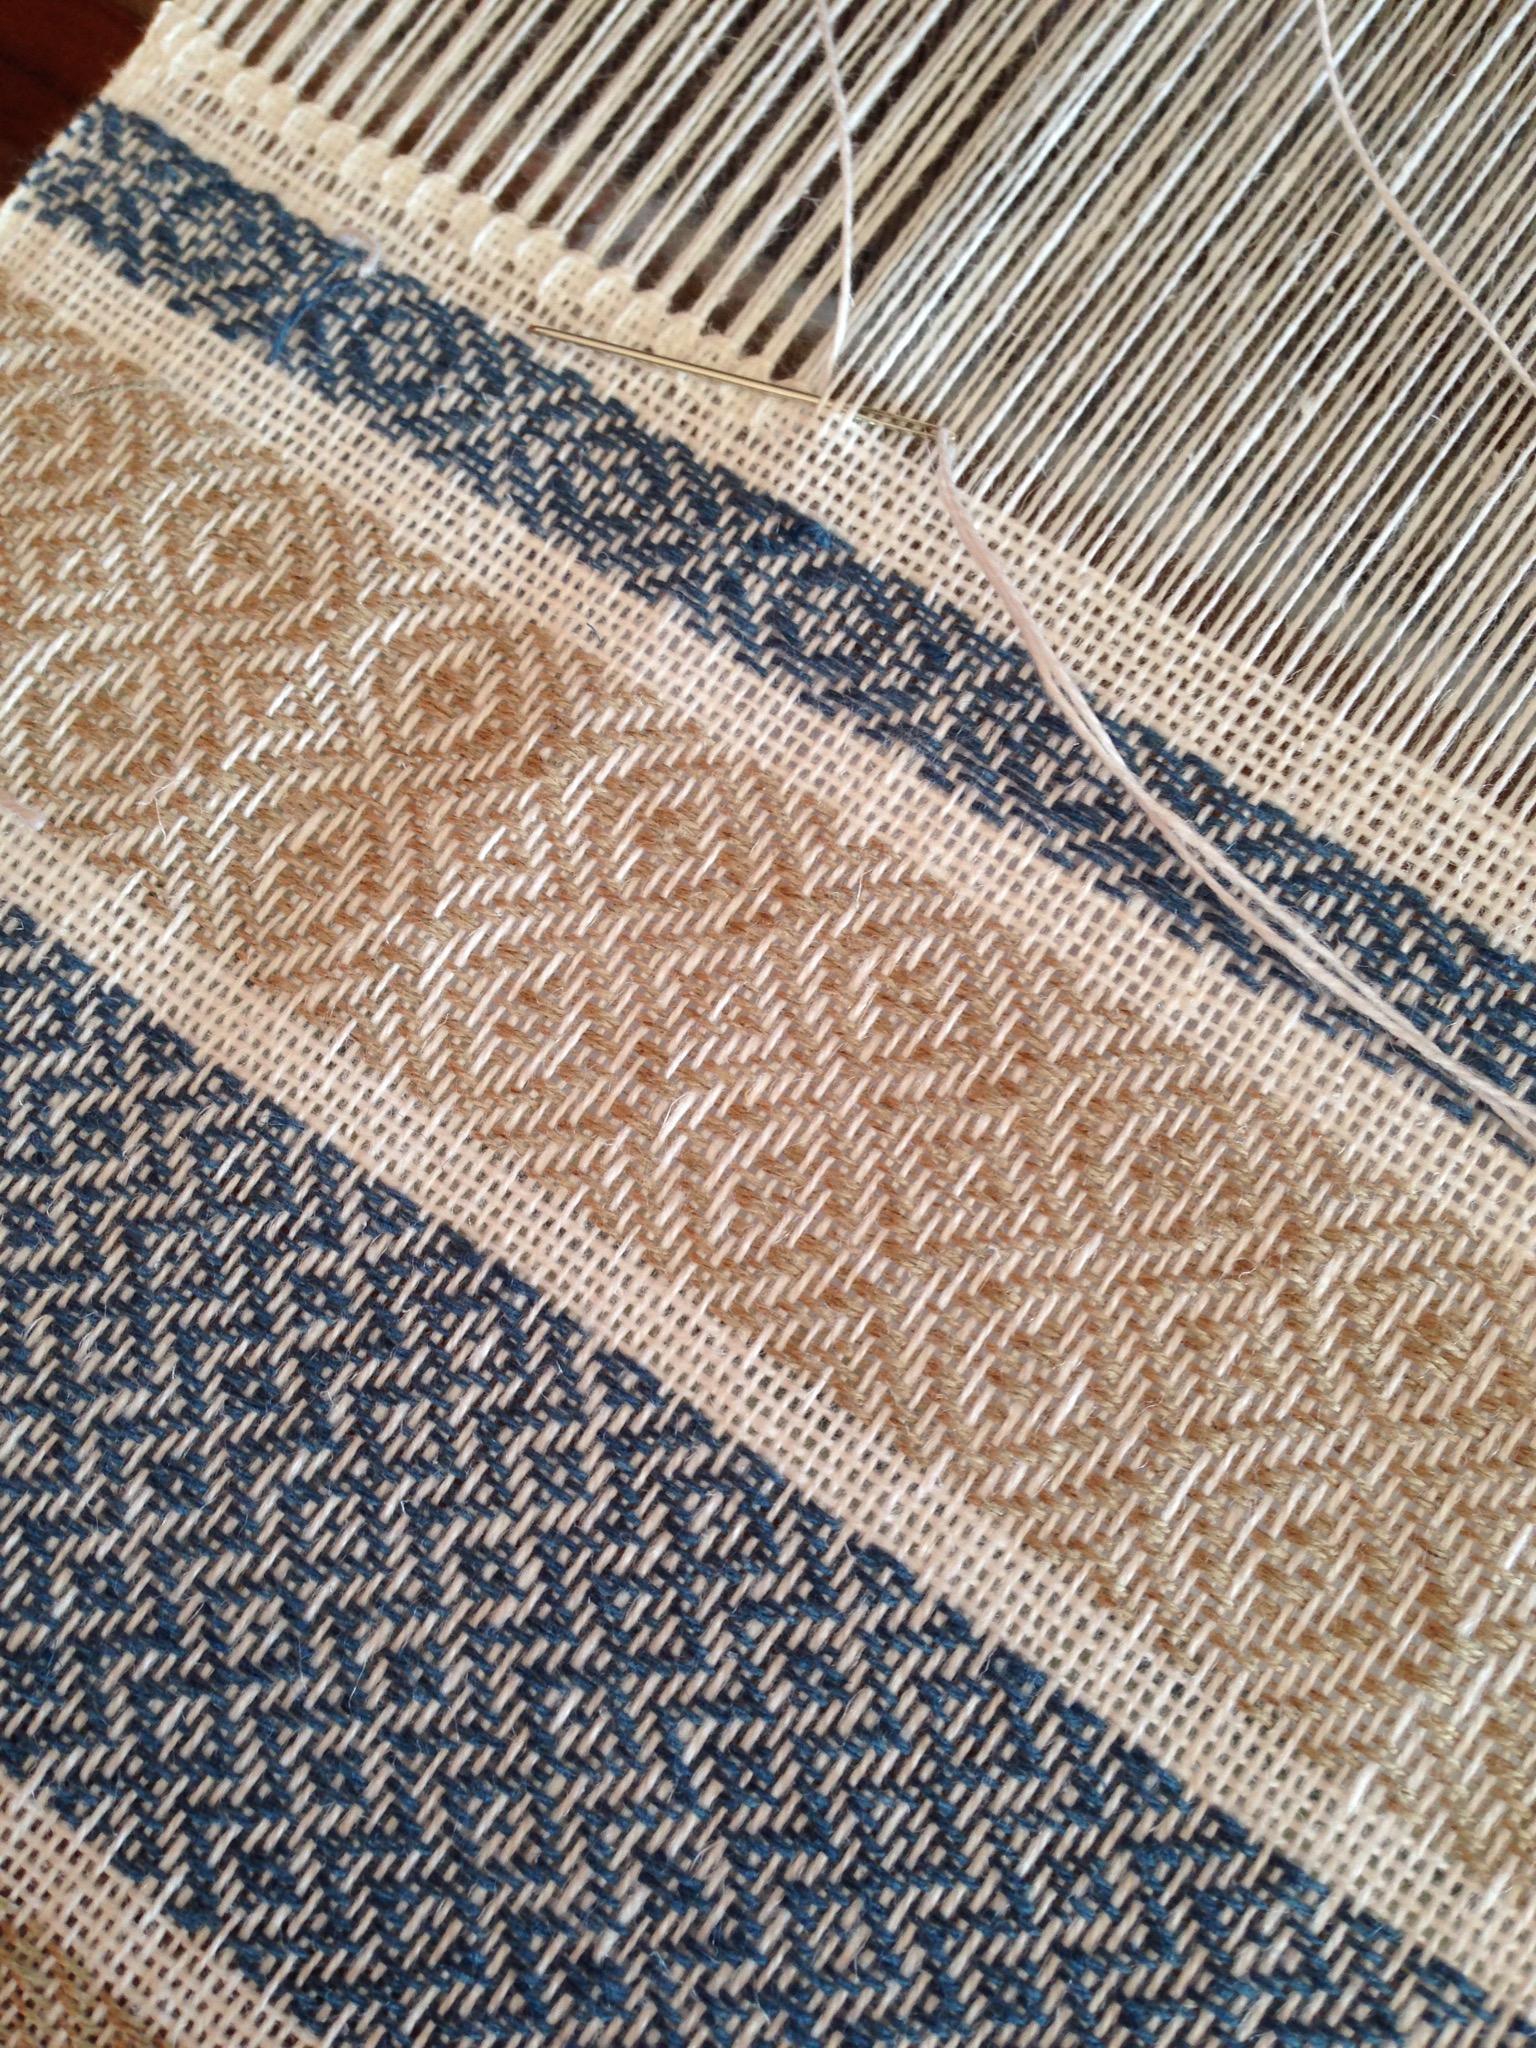 Hem-stitching the tea towel edge